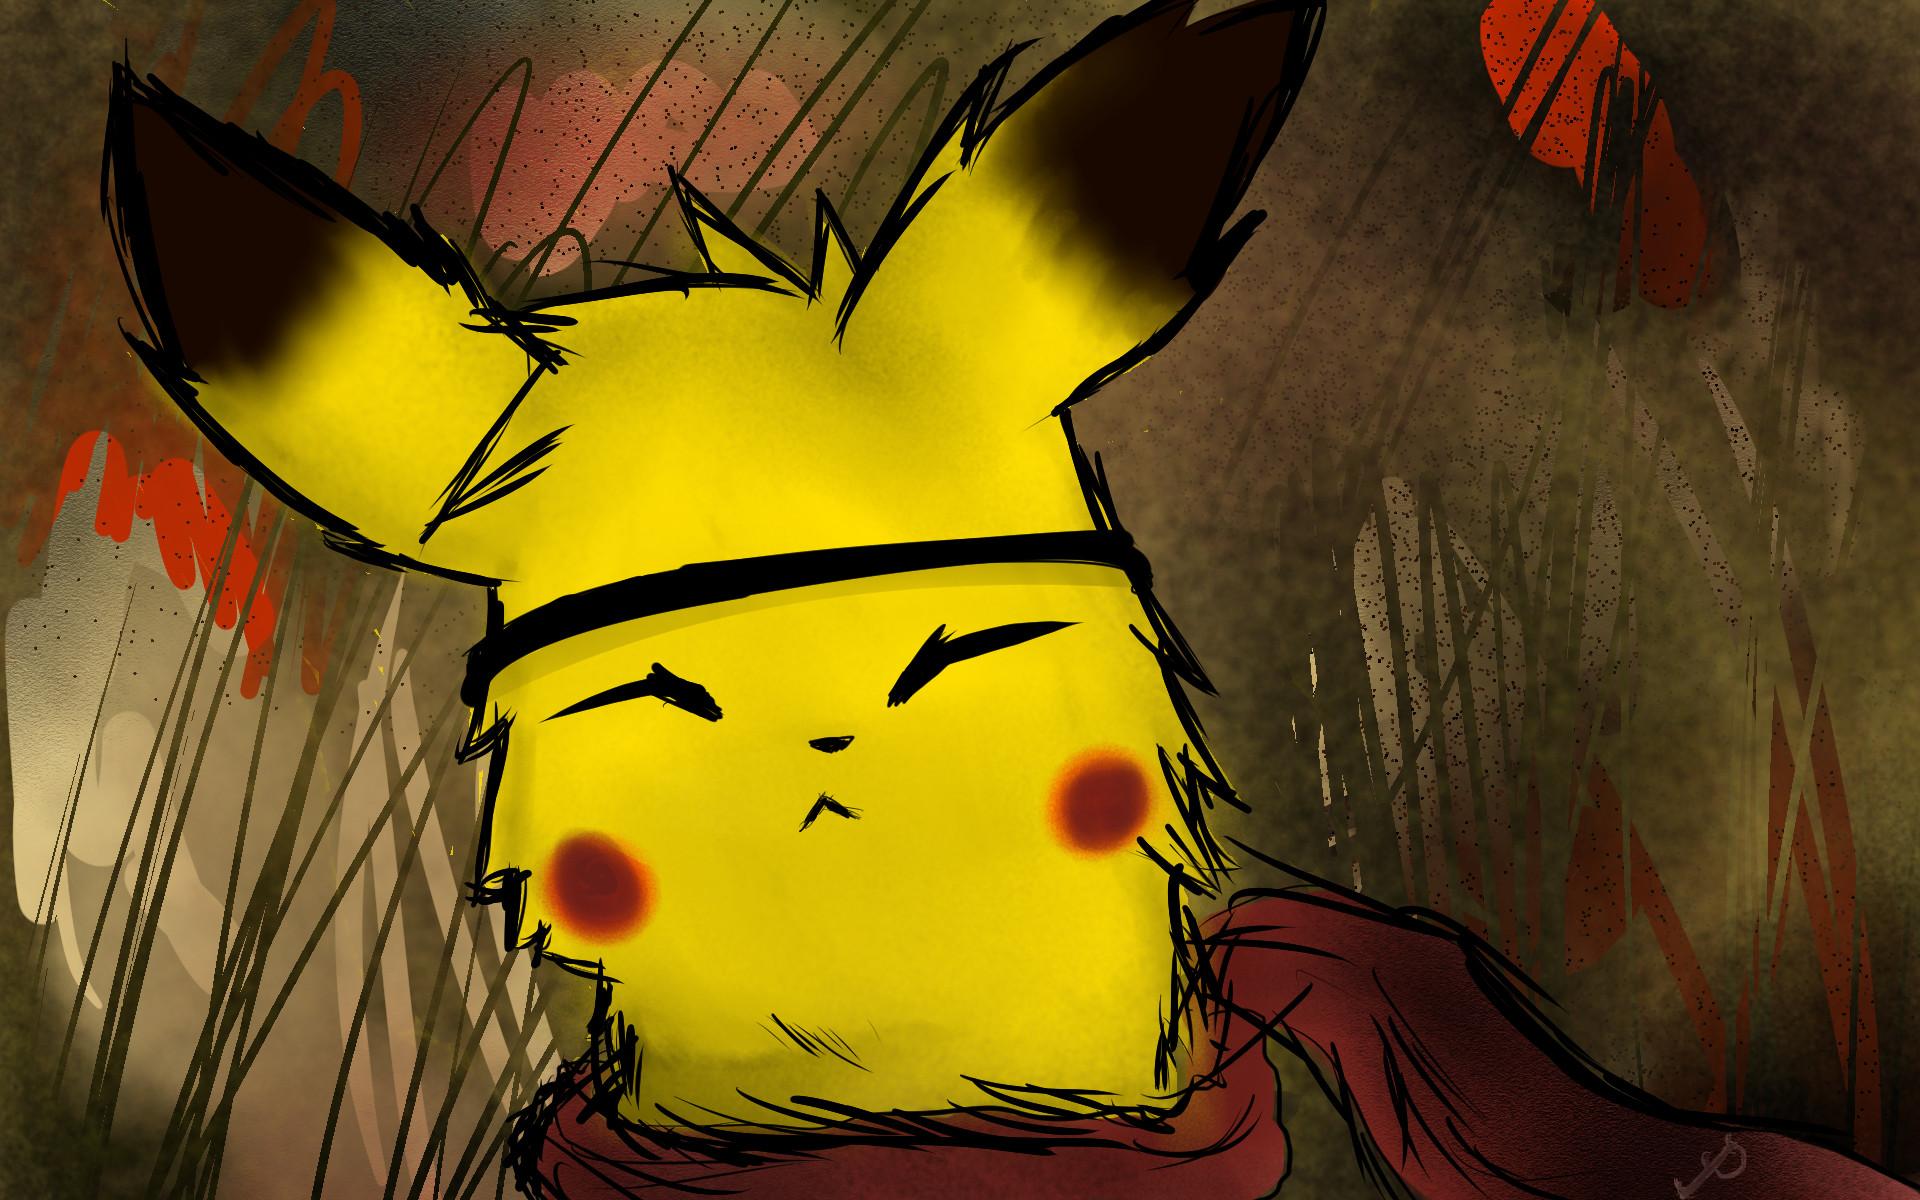 Pikachu Wallpaper by TombieFox Pikachu Wallpaper by TombieFox